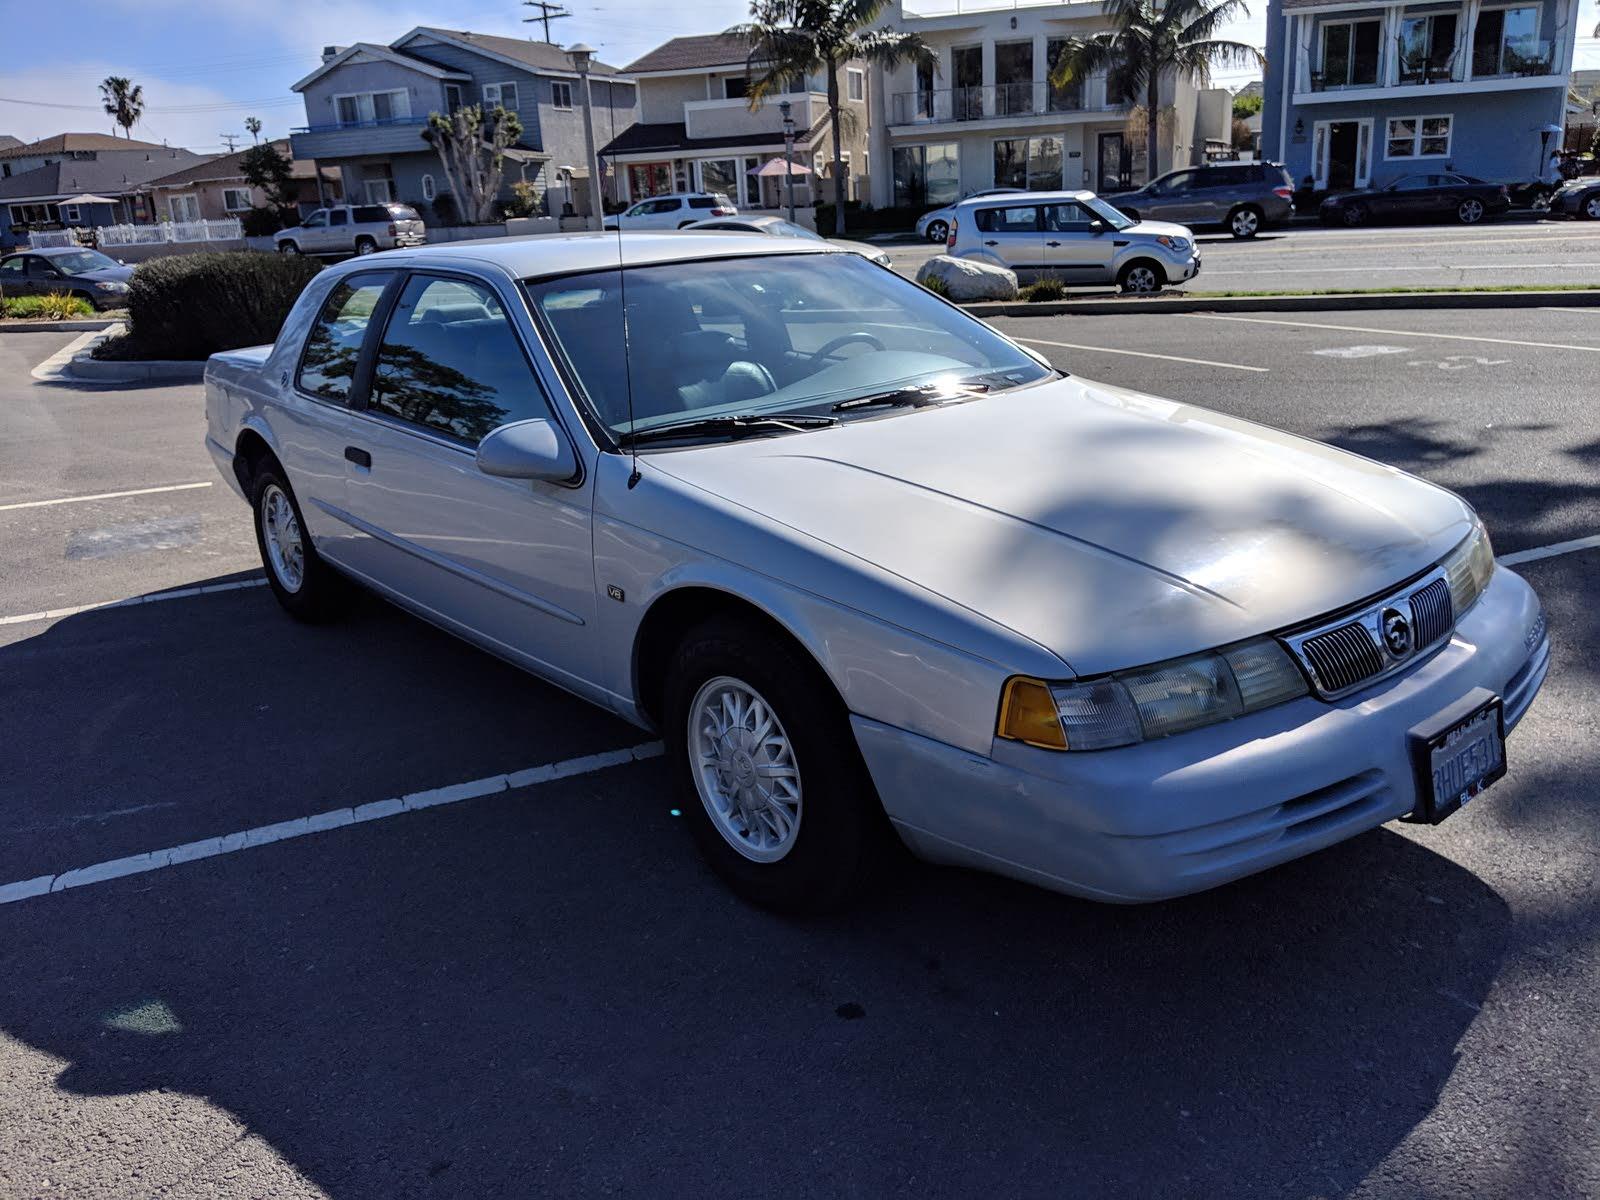 1994 mercury cougar test drive review cargurus 1994 mercury cougar test drive review